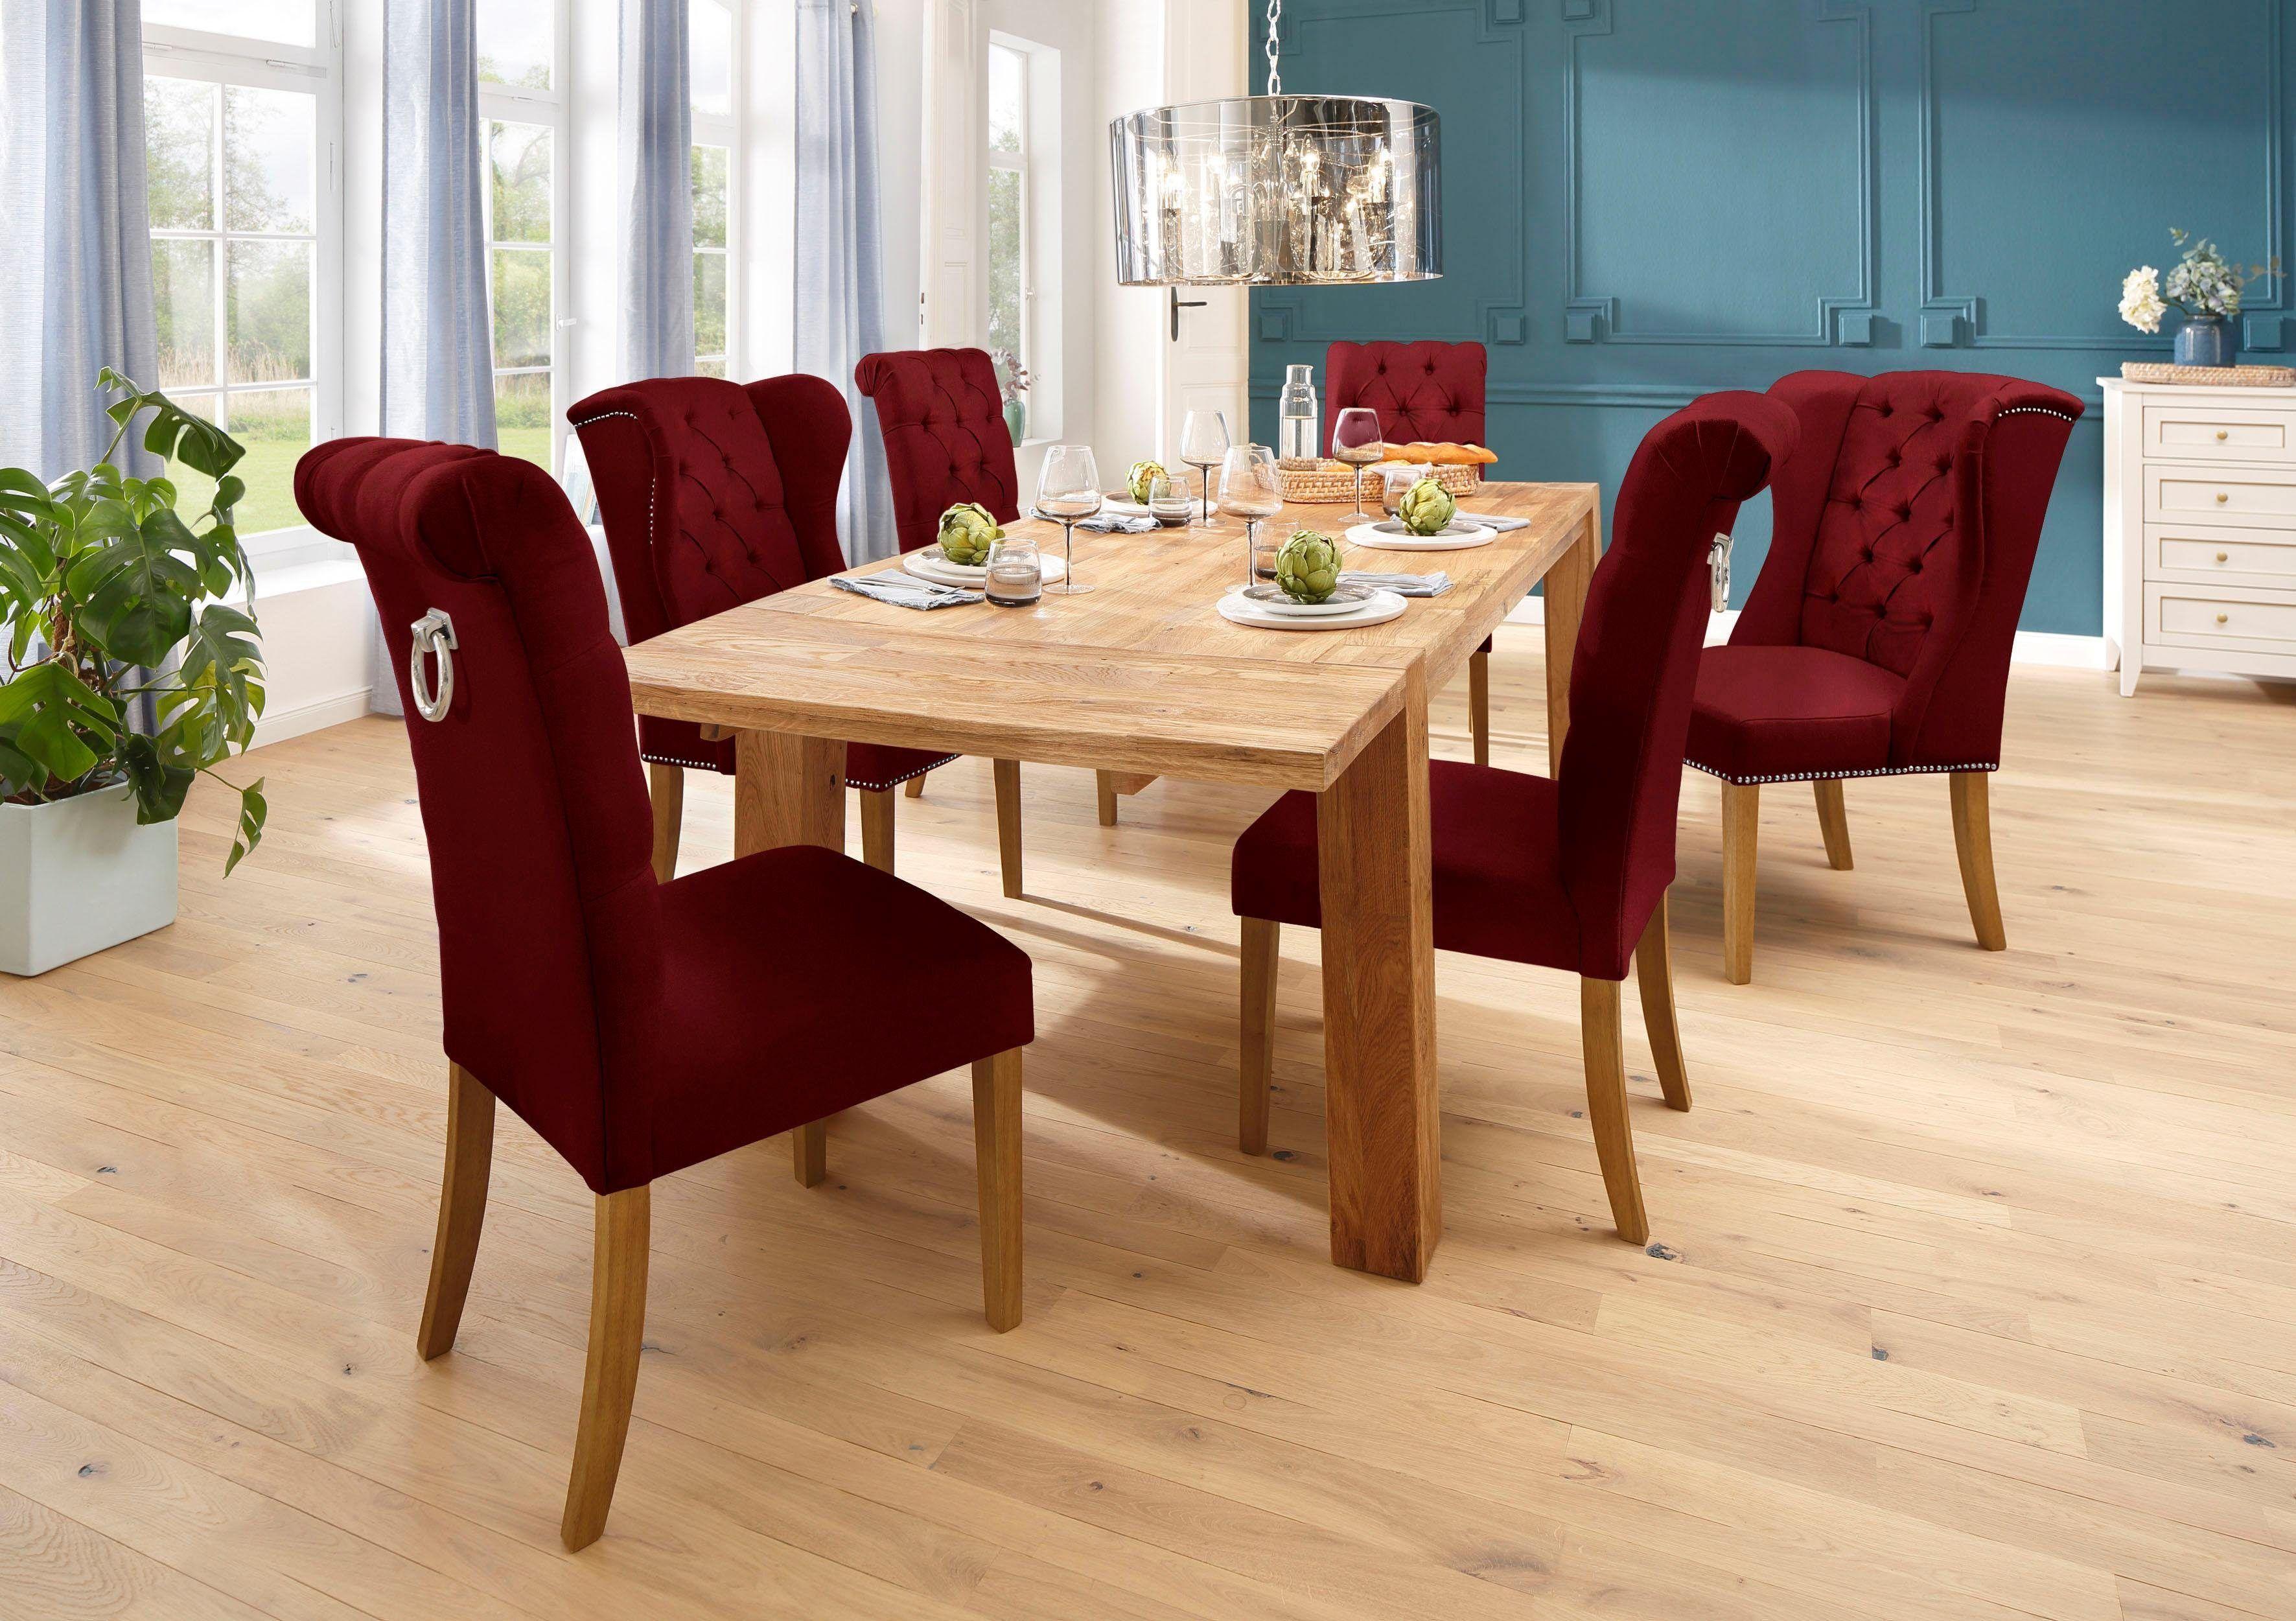 Rote Esszimmer Stuhle Stuhle Esszimmerstuhle Und Haus